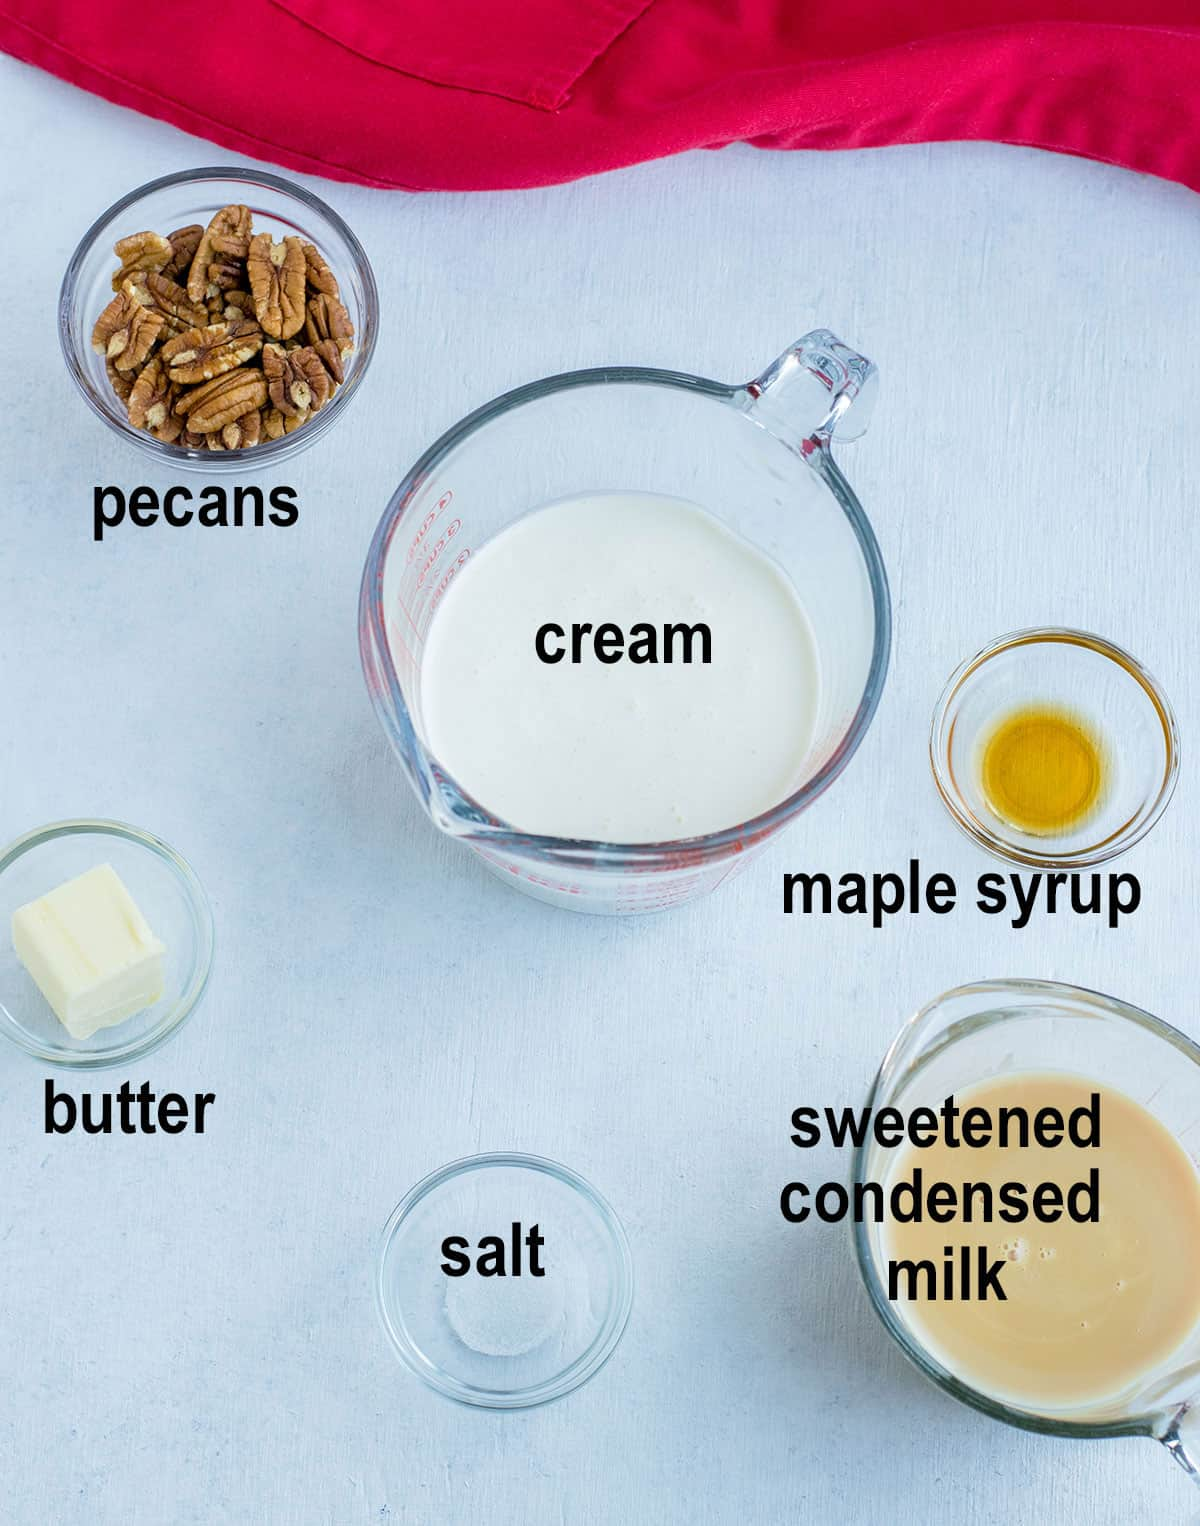 pecans, cream, maple syrup, sweetened condensed milk, salt, butter